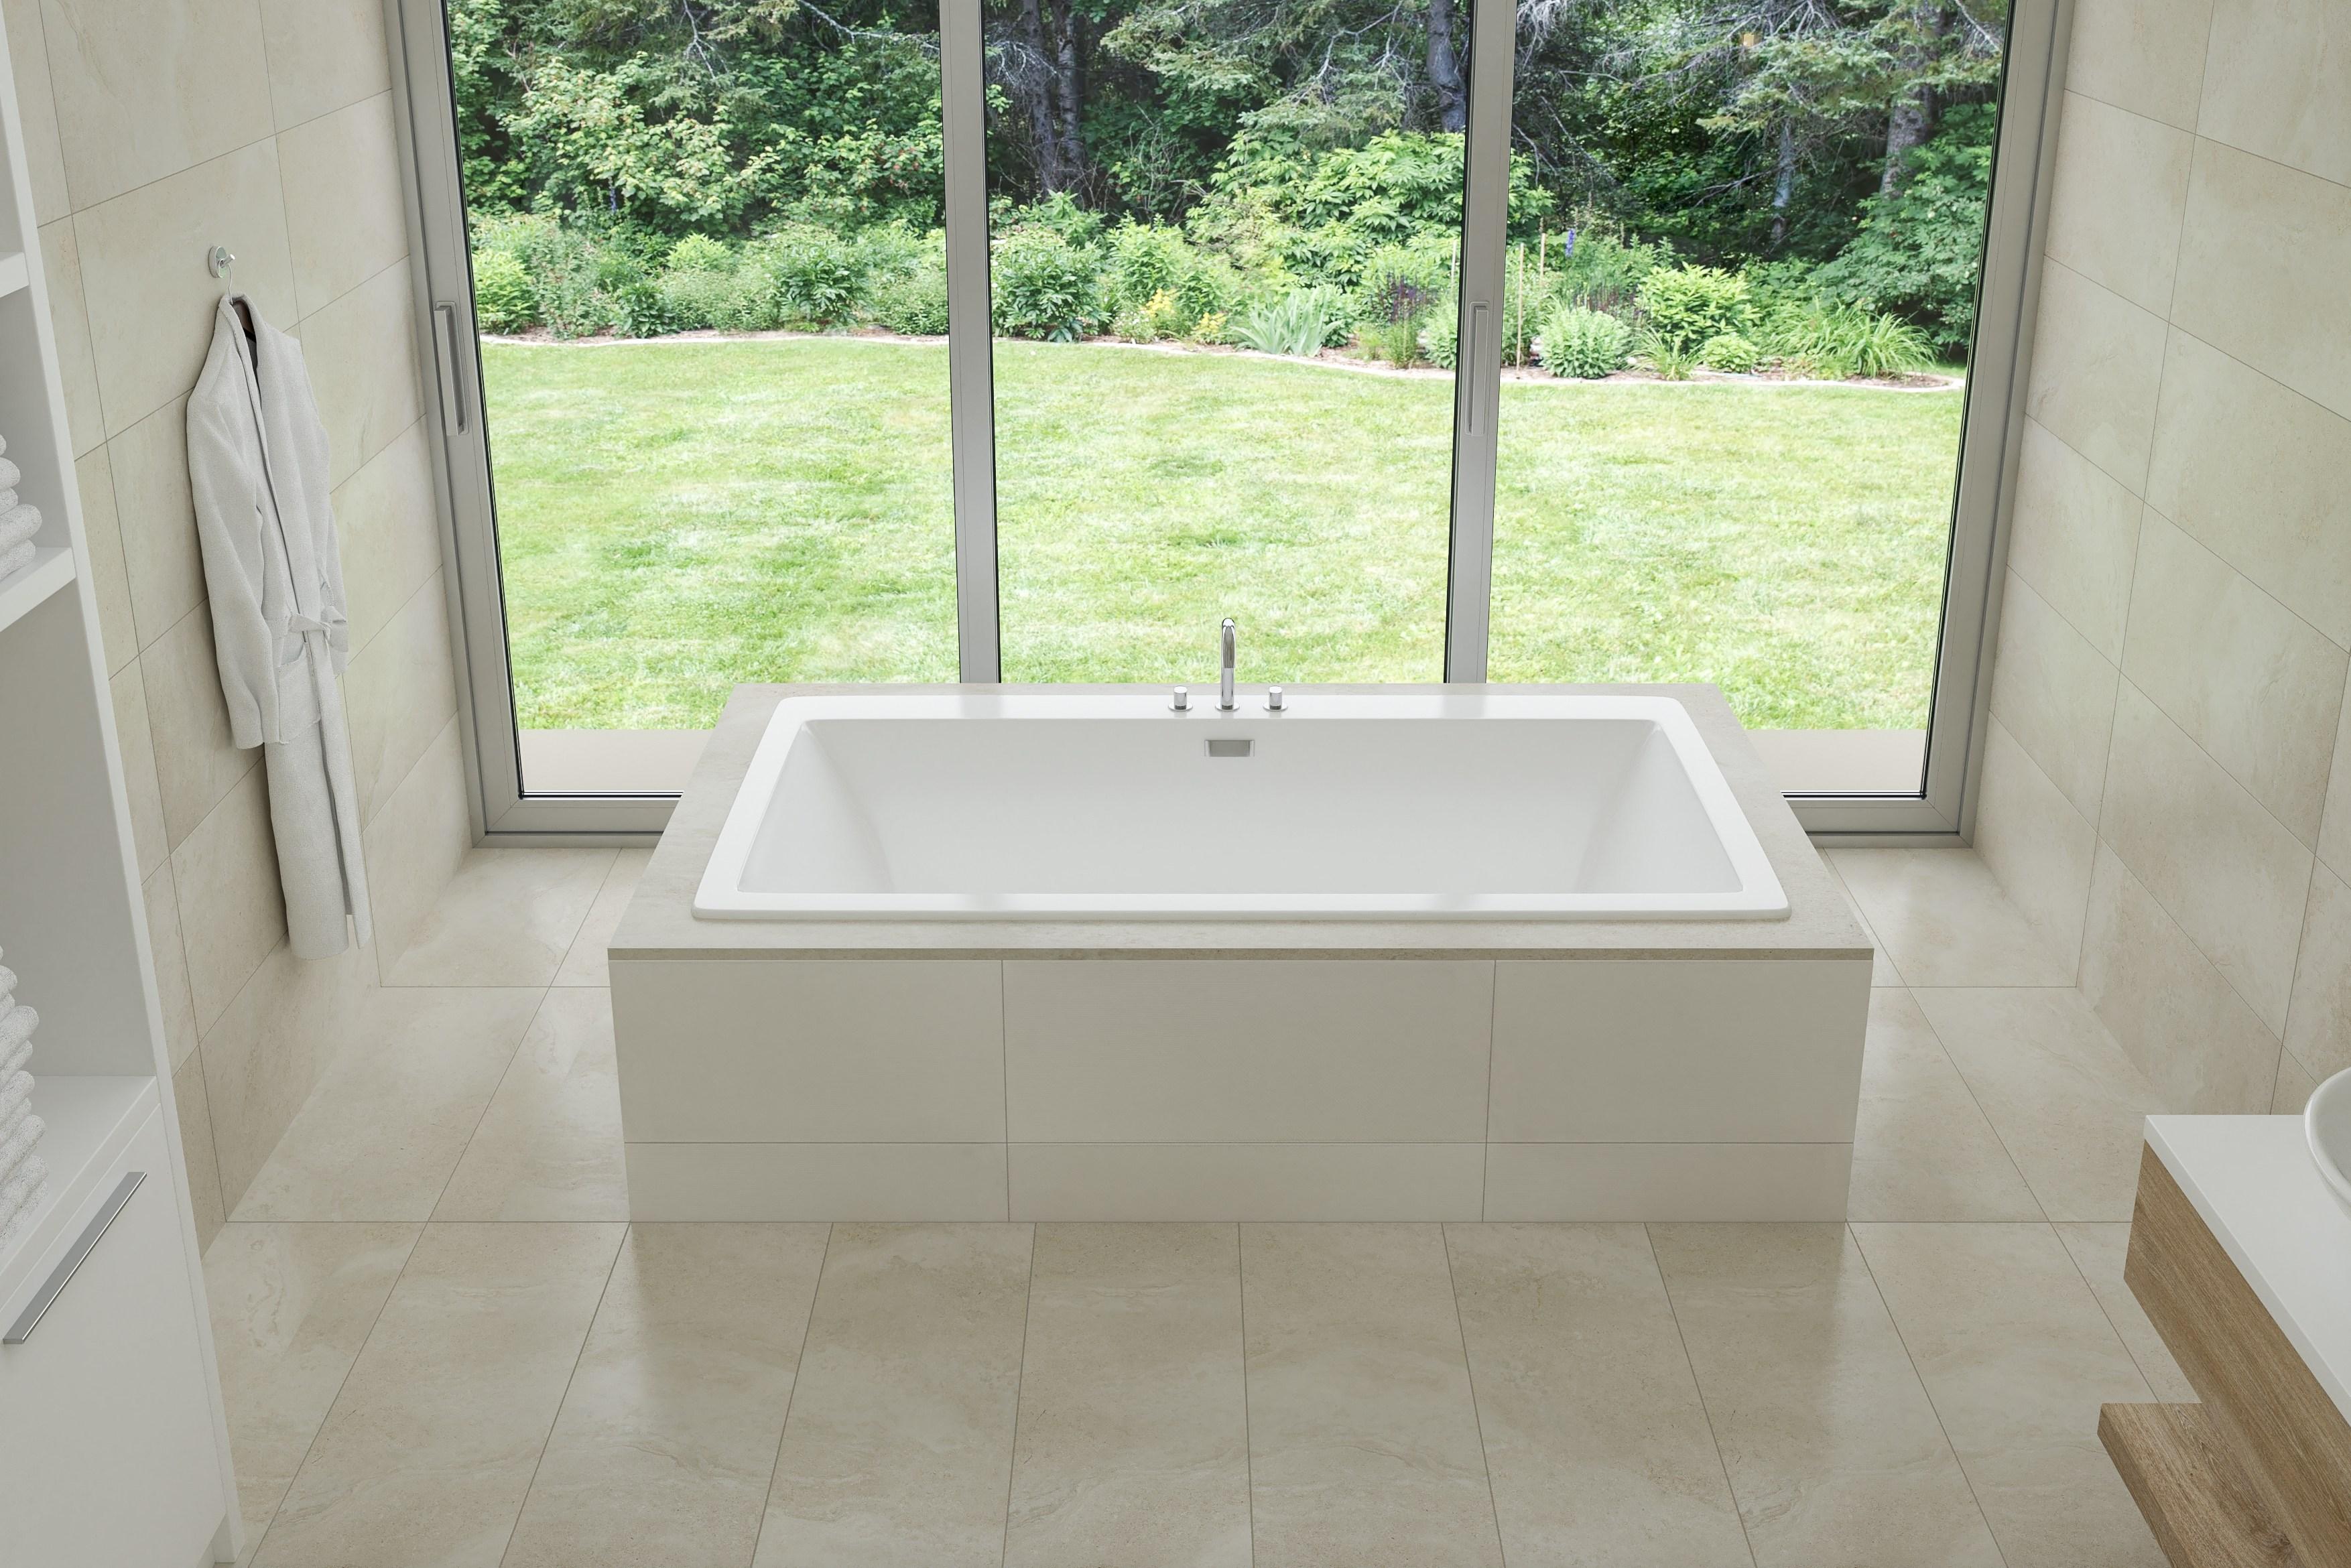 Beacon 67x36 Drop-In Tub - Waterflo